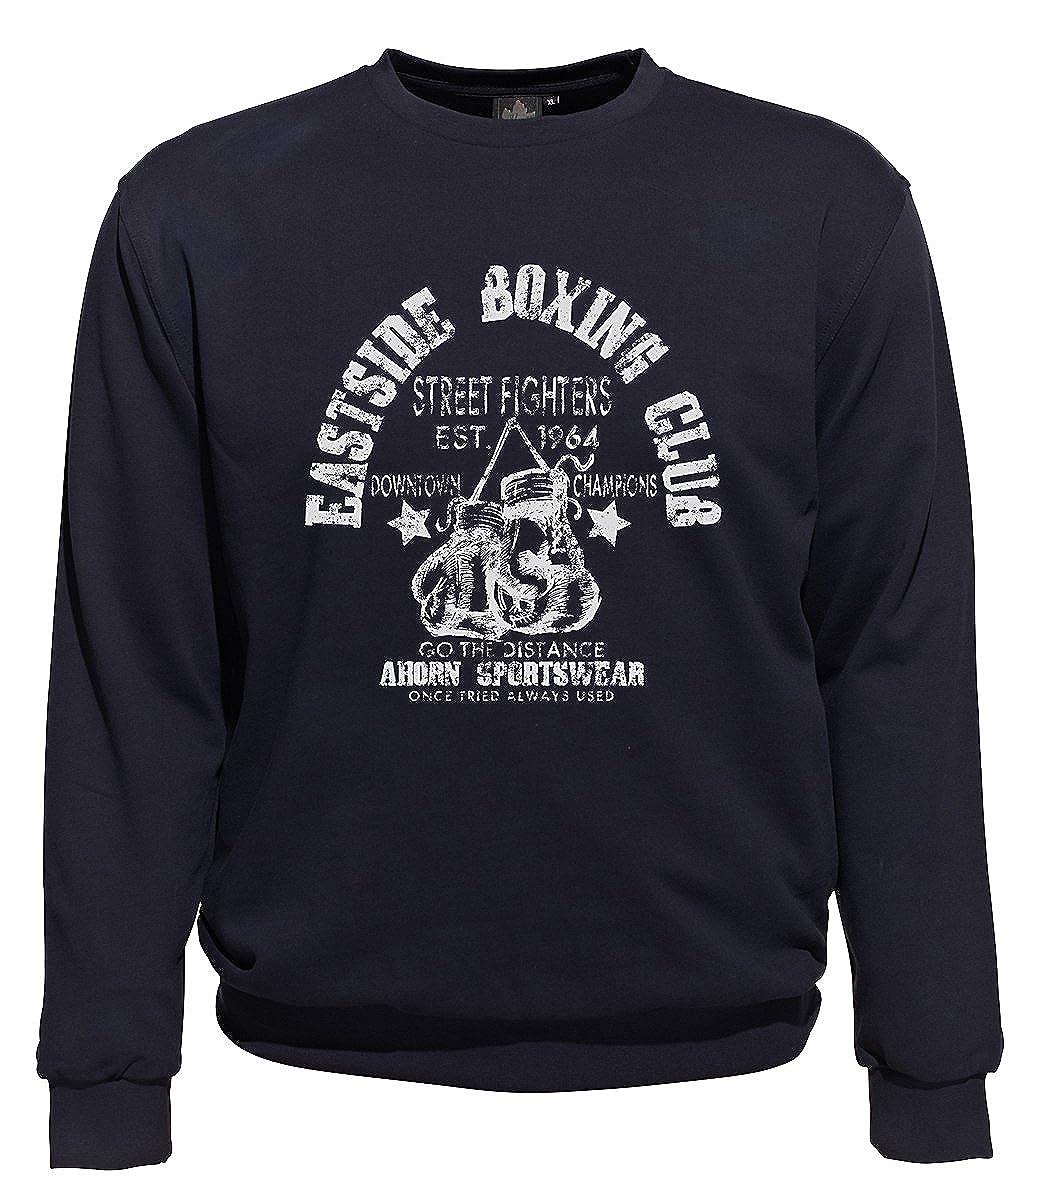 Ahorn Sportswear Übergrößen   Sweatshirt Boxing Club Navy 3XL-10XL